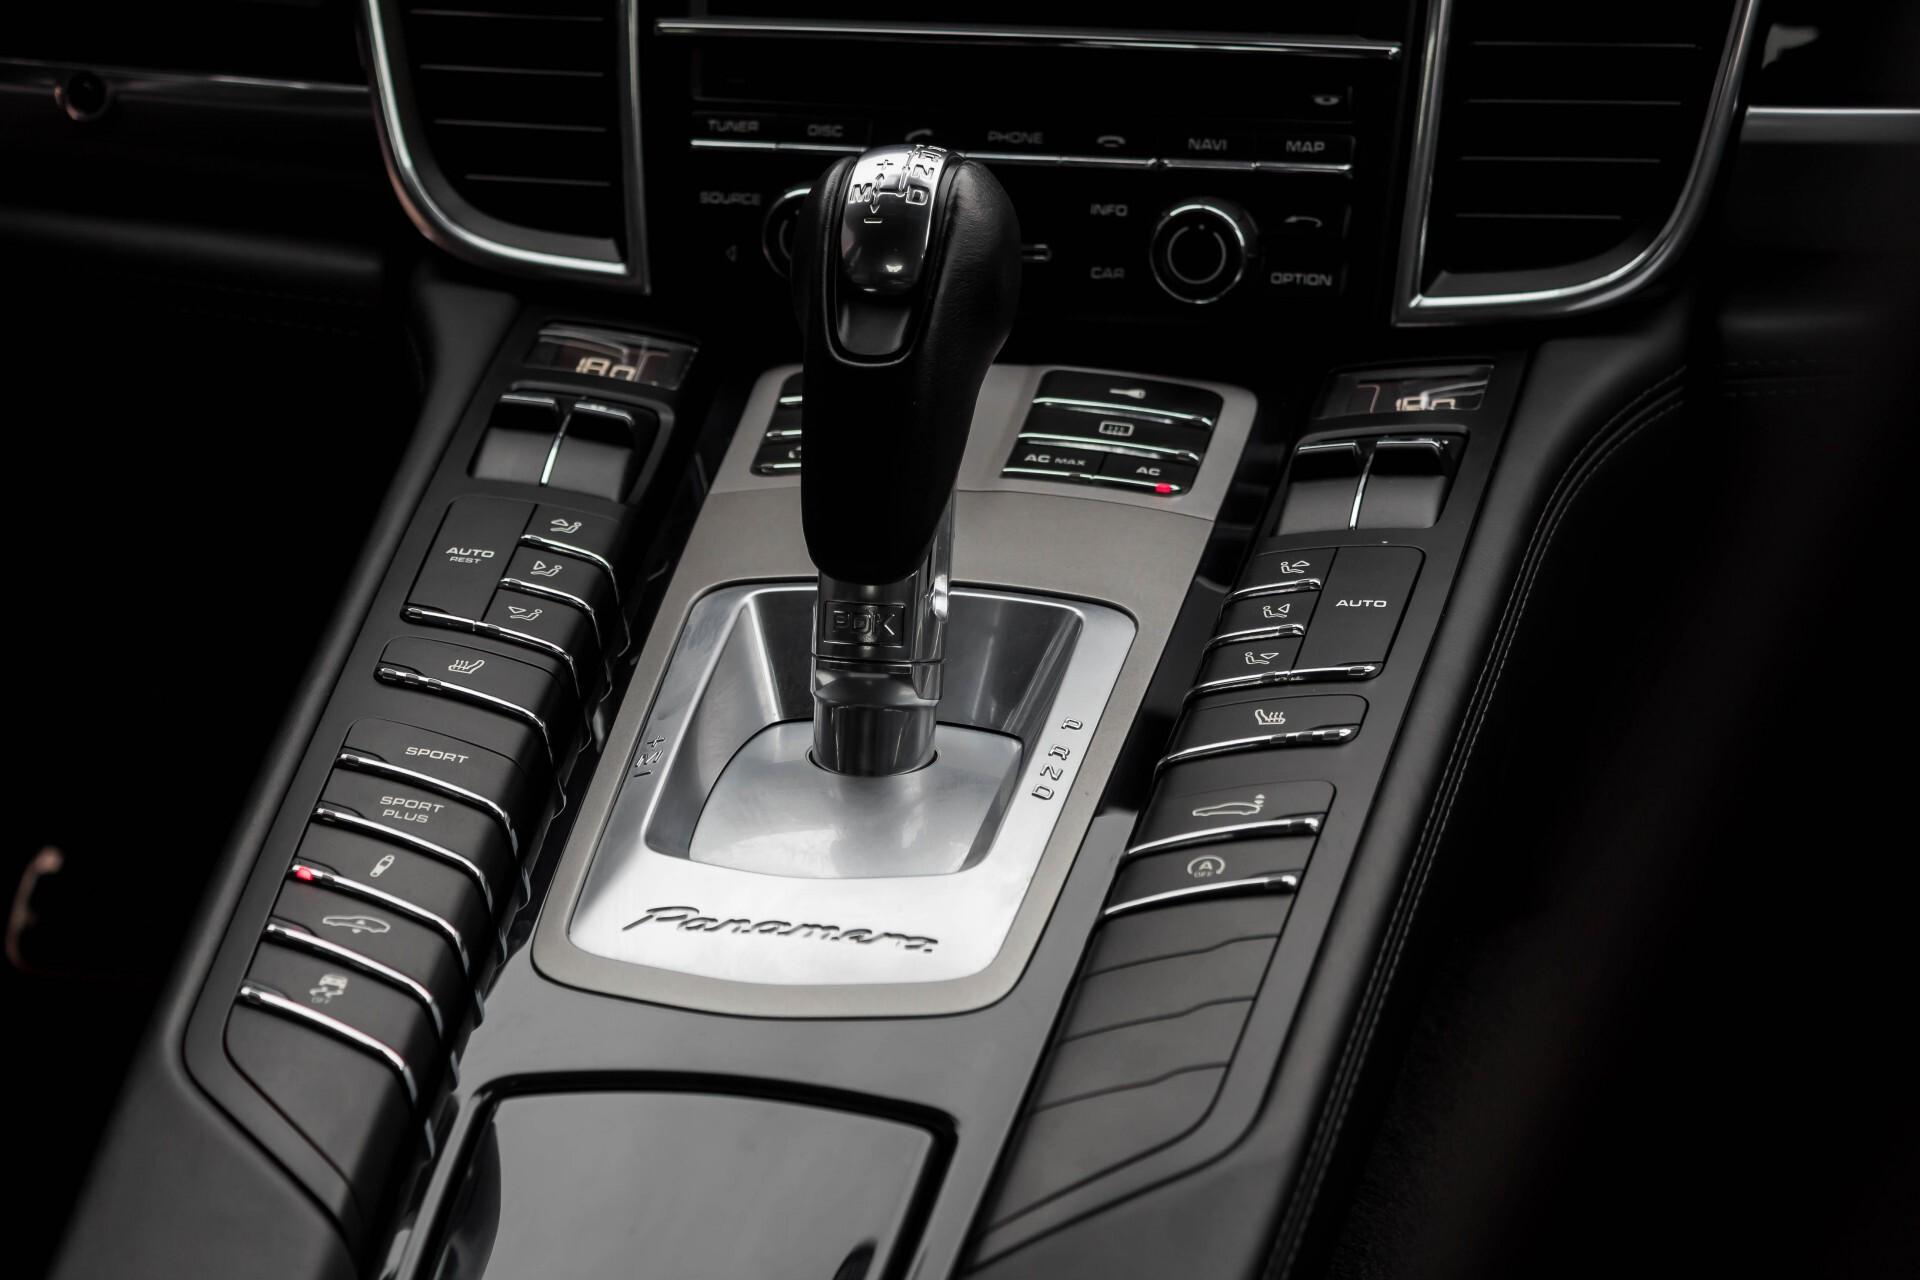 Porsche Panamera 3.6 4 Sportchrono/Luchtvering/Dak/Nappa/Aut7 Foto 28